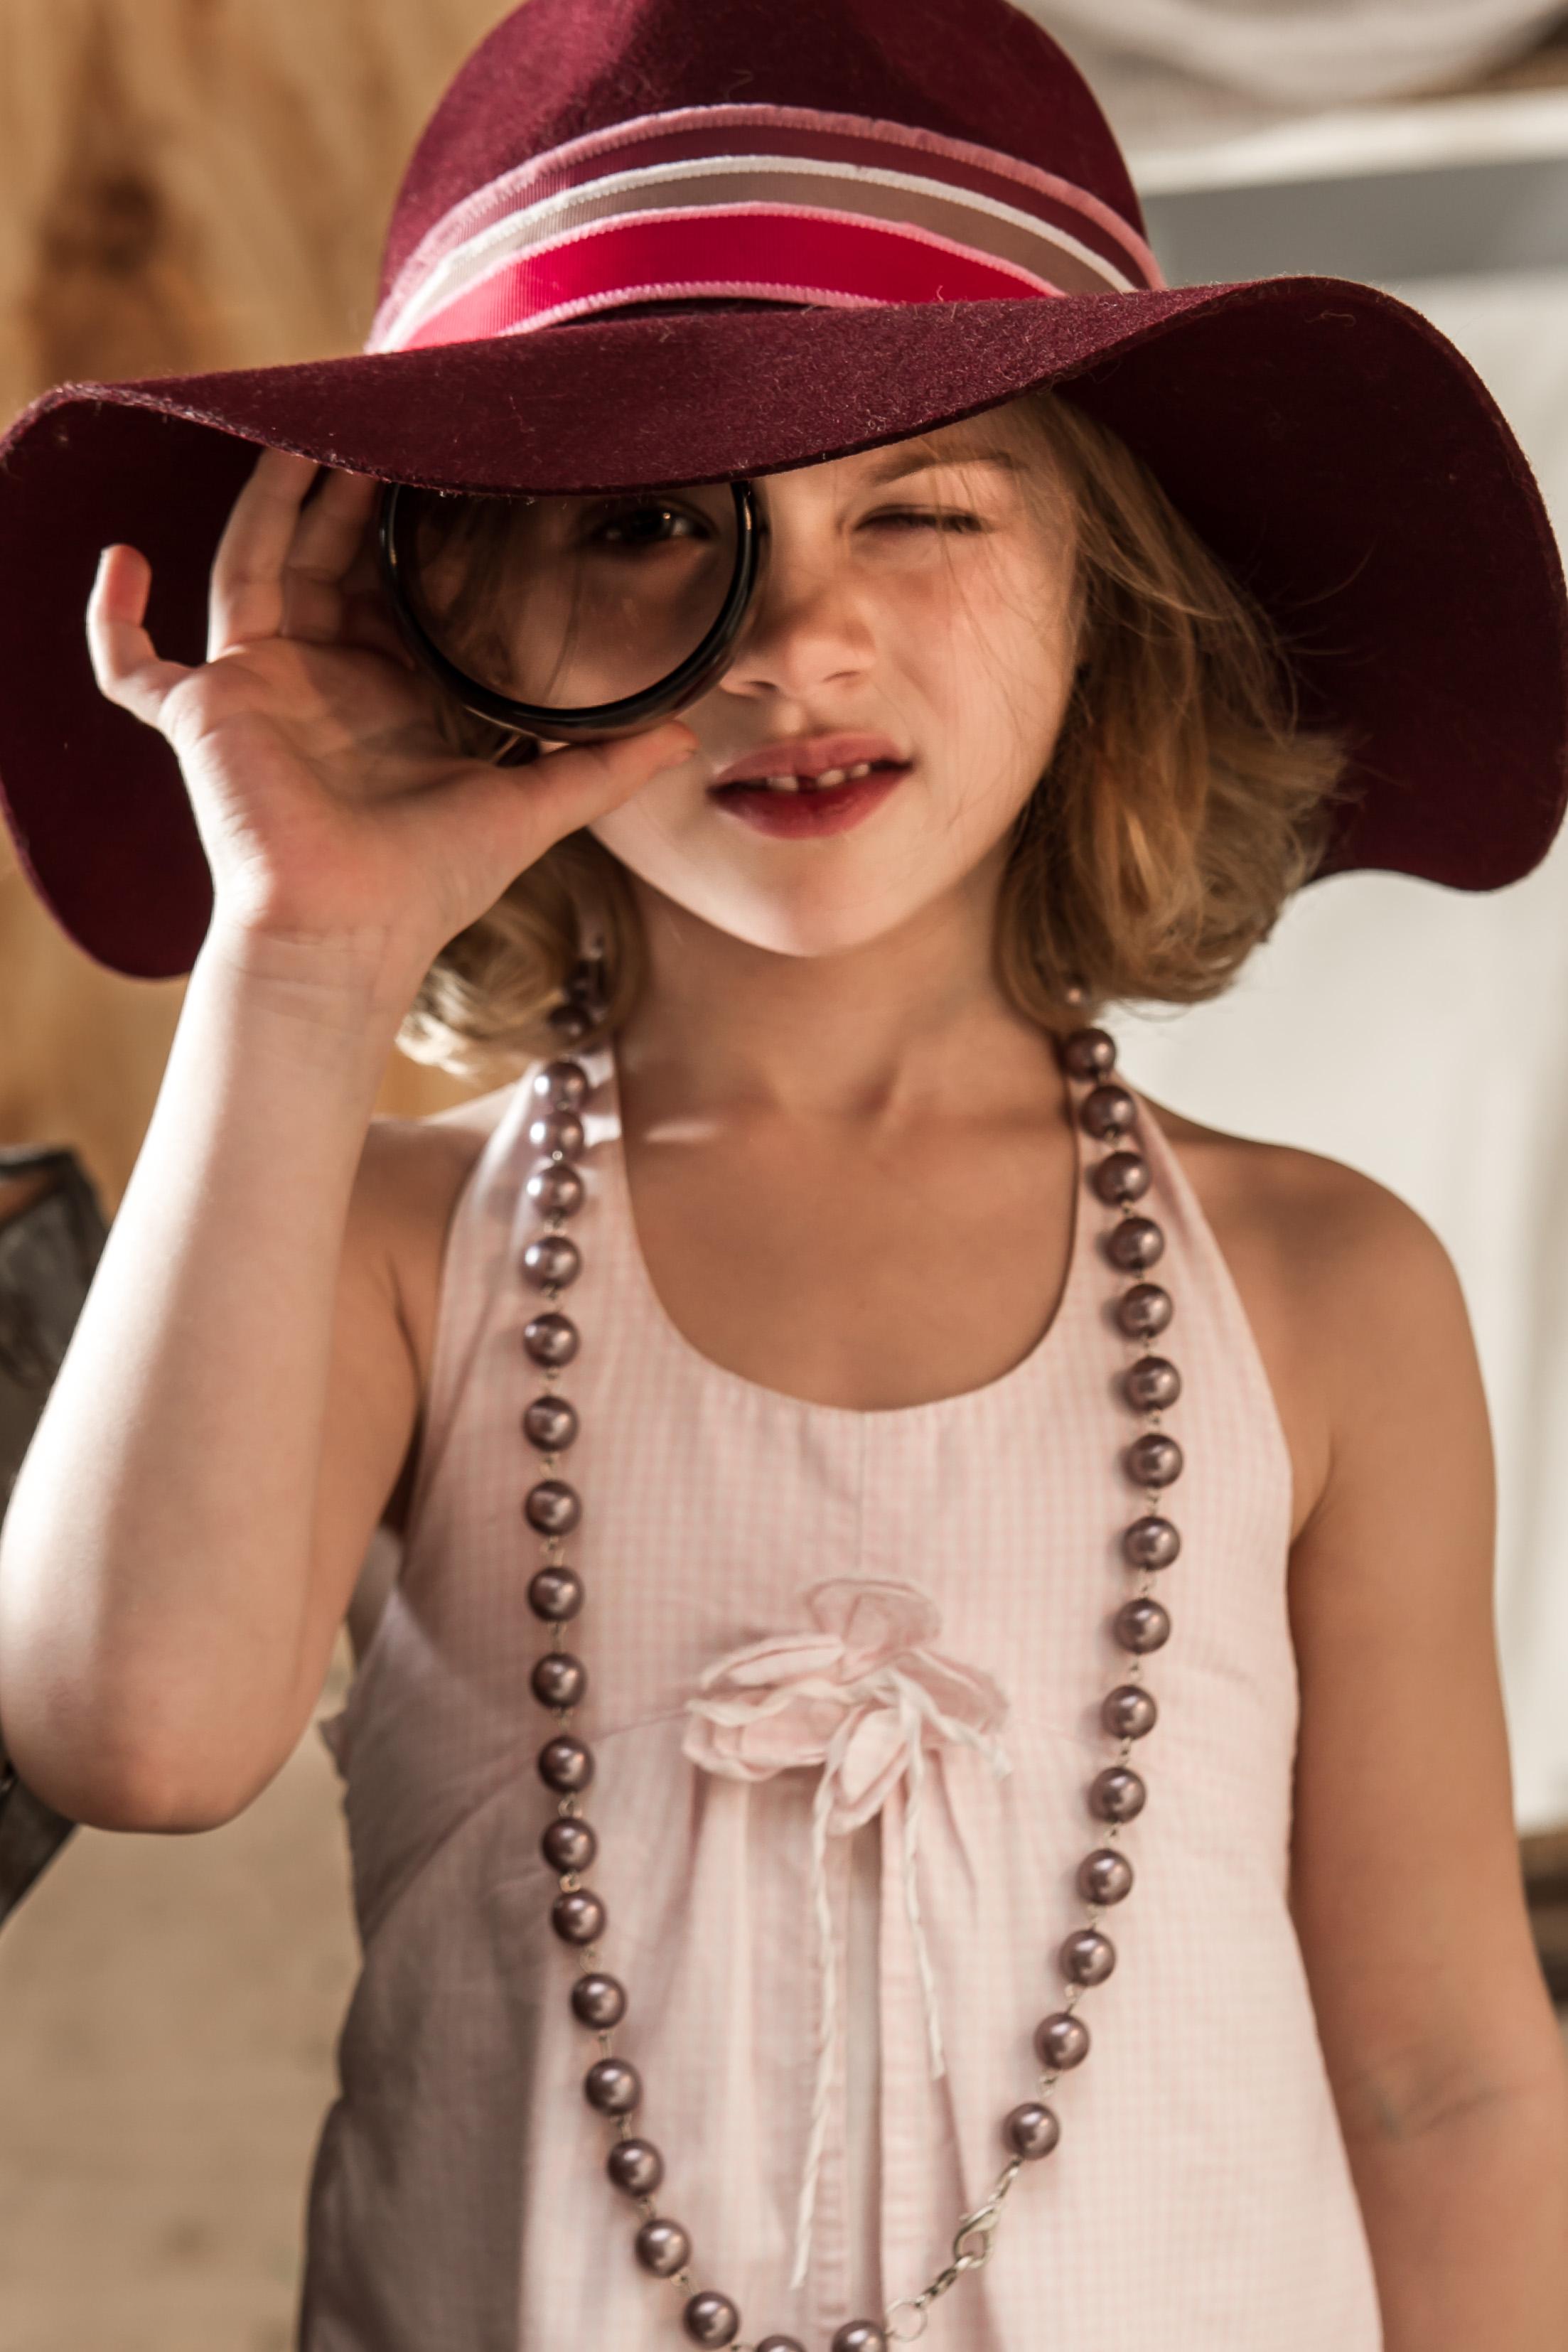 Little Girl Playing Dress-up-2.jpg